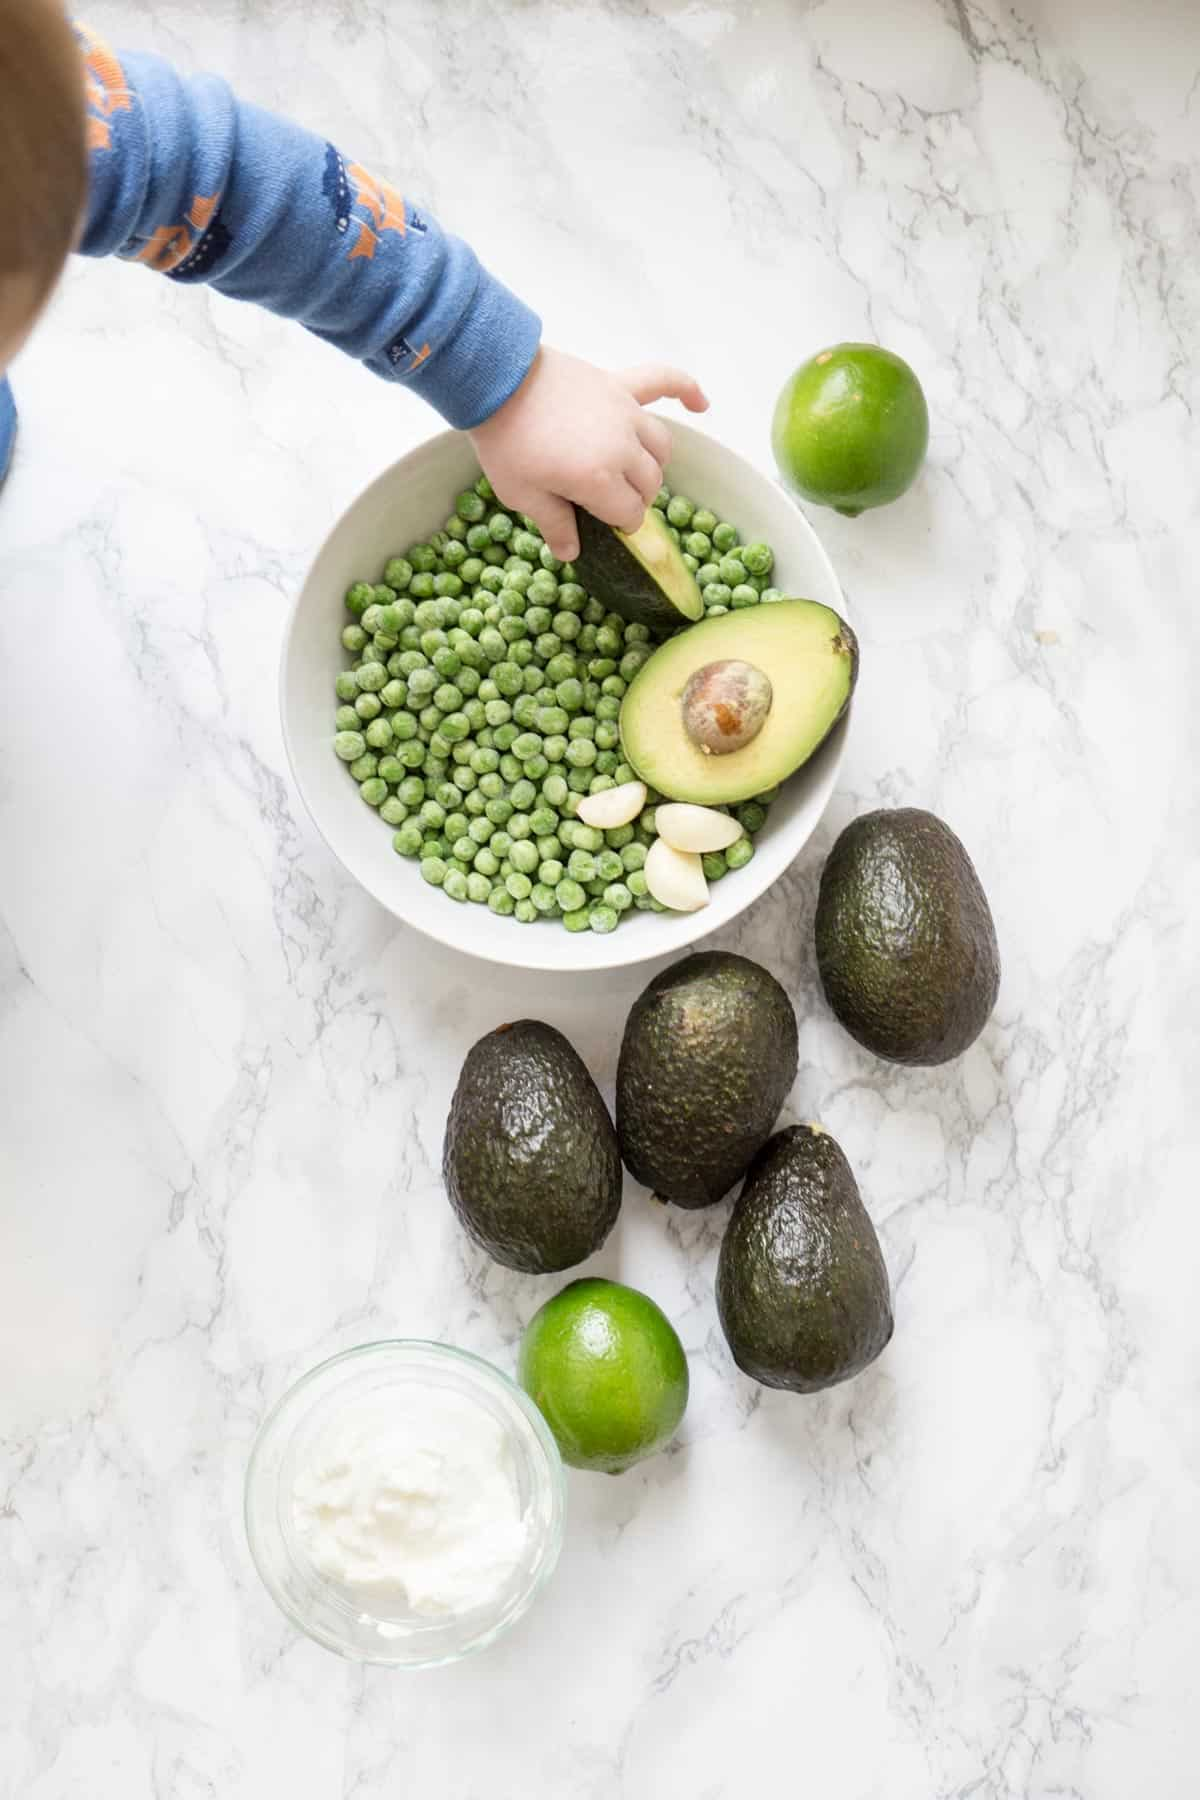 Ingredients for Avocado Cream Sauce